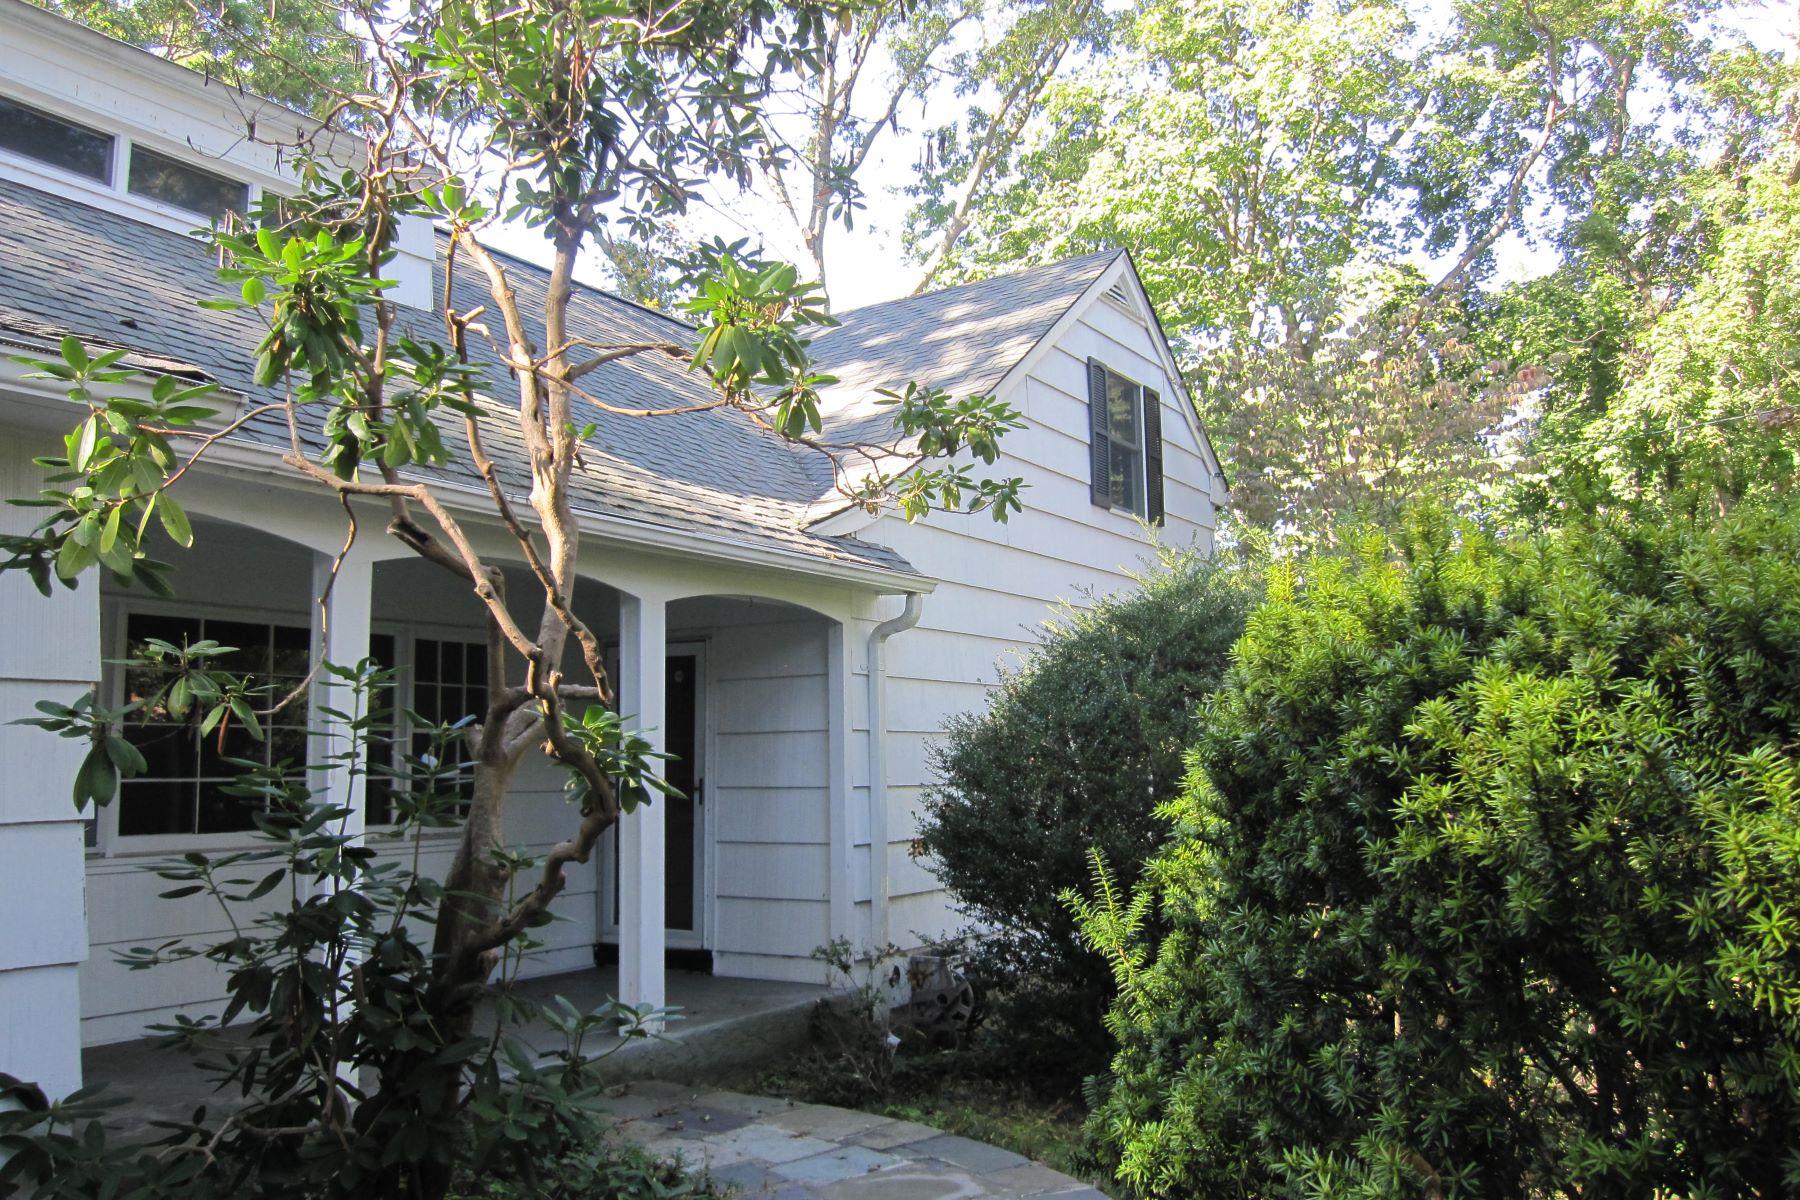 واحد منزل الأسرة للـ Sale في 128 Quaker Road, Setauket, NY 11733 128 Quaker Rd, Setauket, New York, 11733 United States